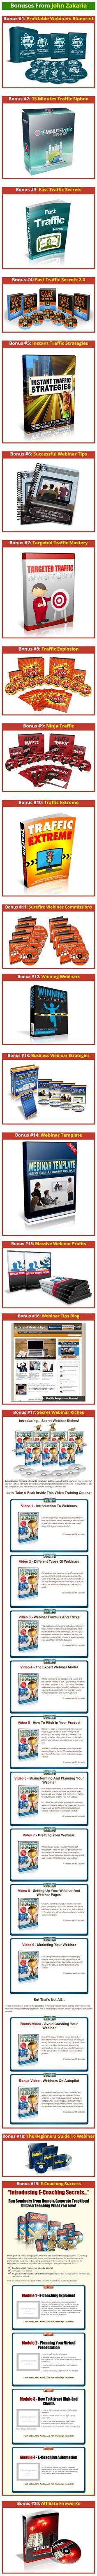 Run A Webinar Review+BEST BONUS+Discount - Run Unlimited Profitable Webinars Without Google Hangouts Warrior Forum Classified Ads